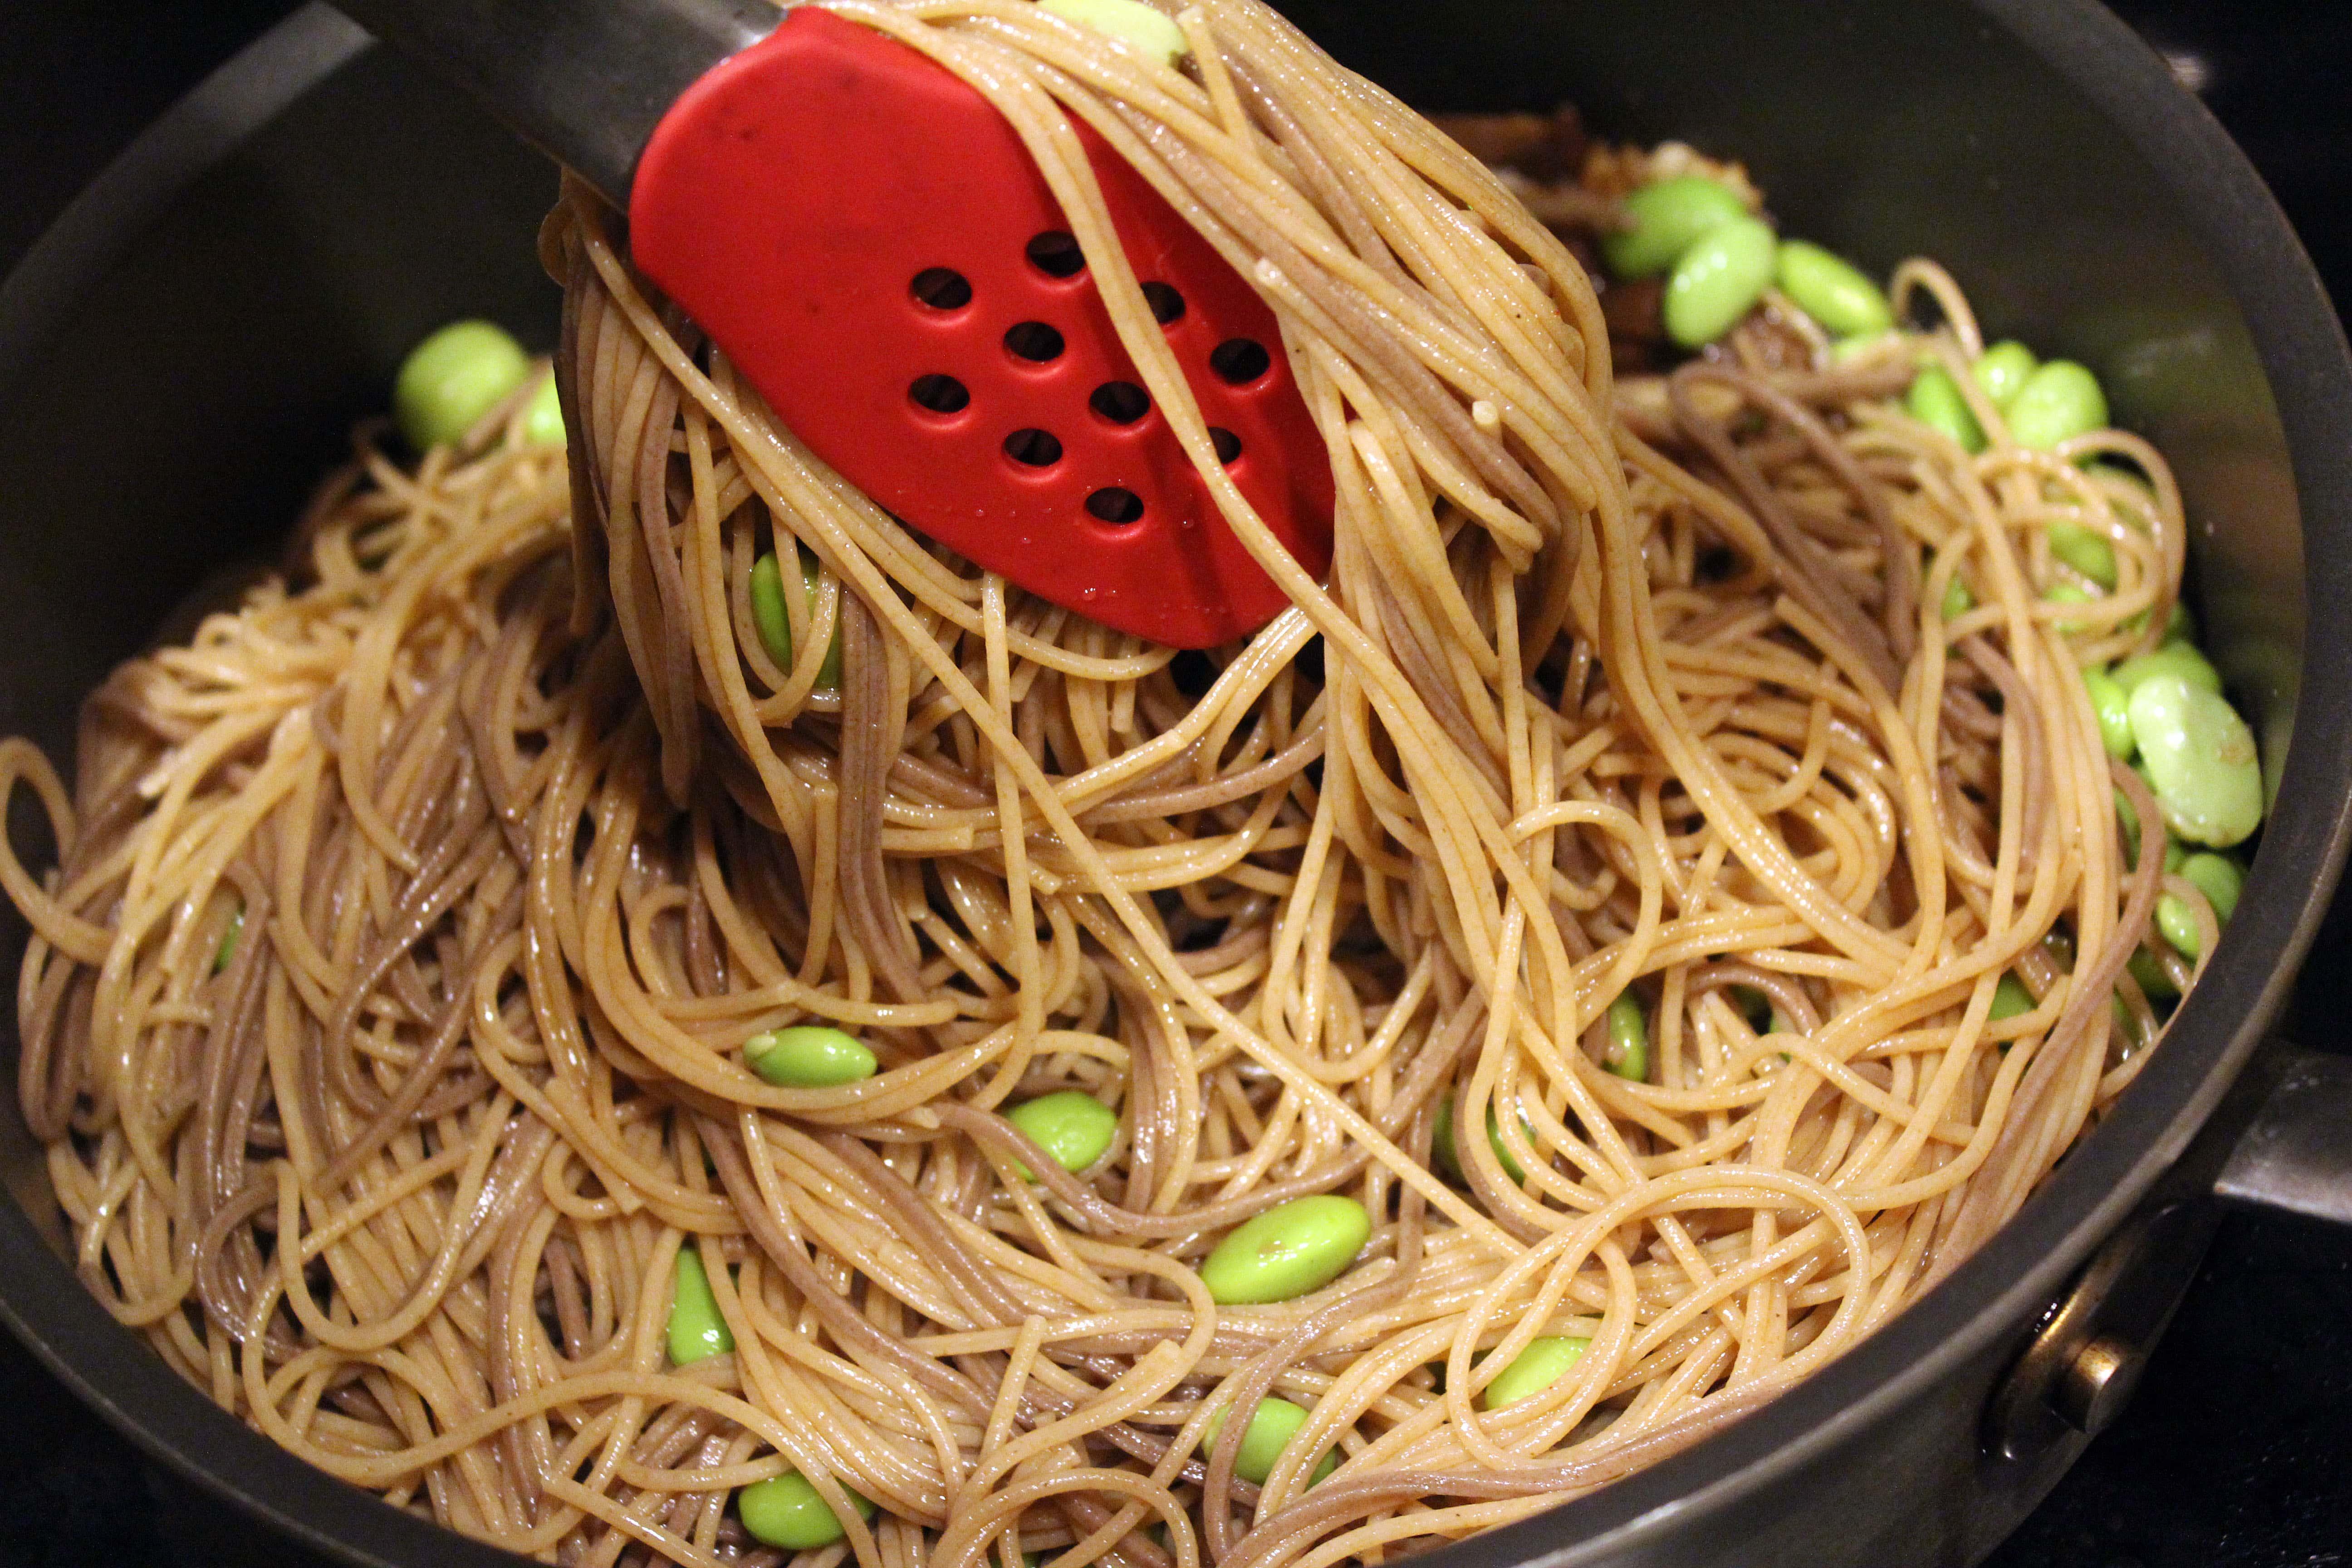 Toss pasta with sauce